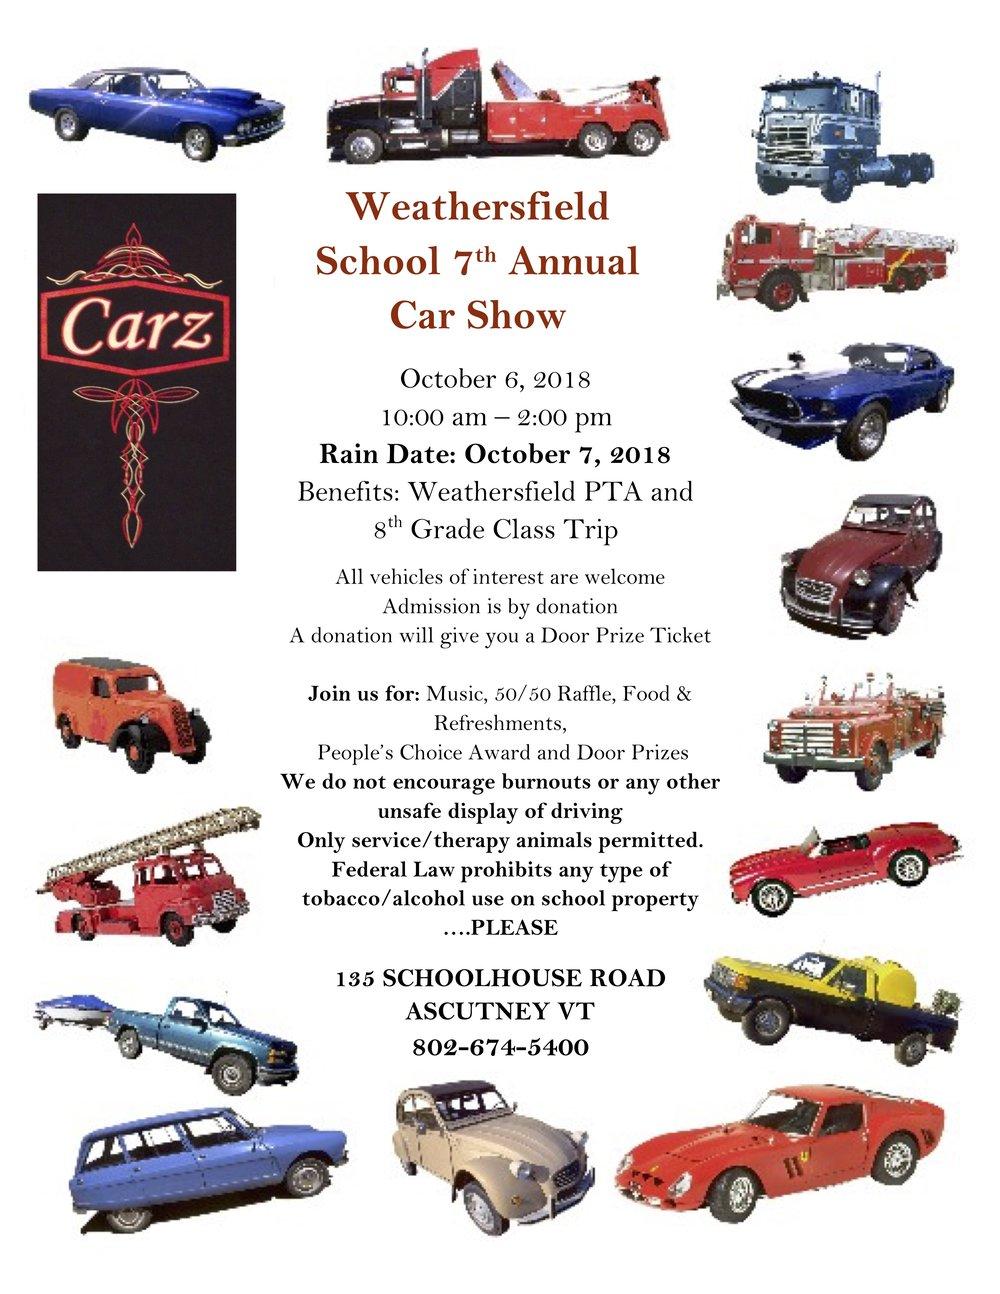 Car Show Flyer 2018.jpg